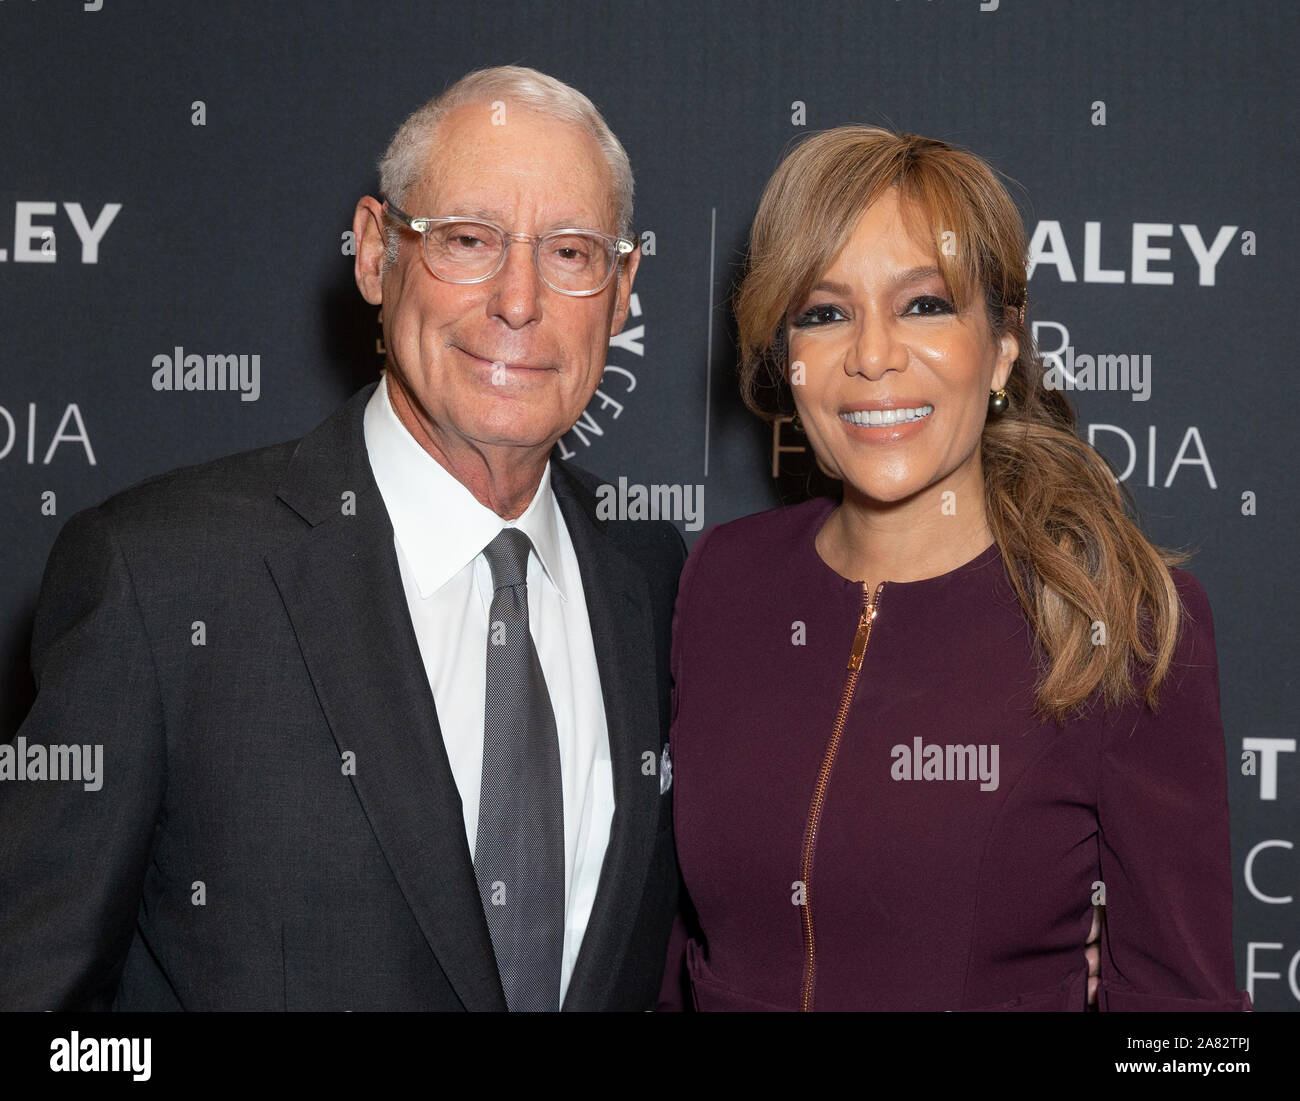 New York Ny November 5 2019 Henry Schleiff And Sunny